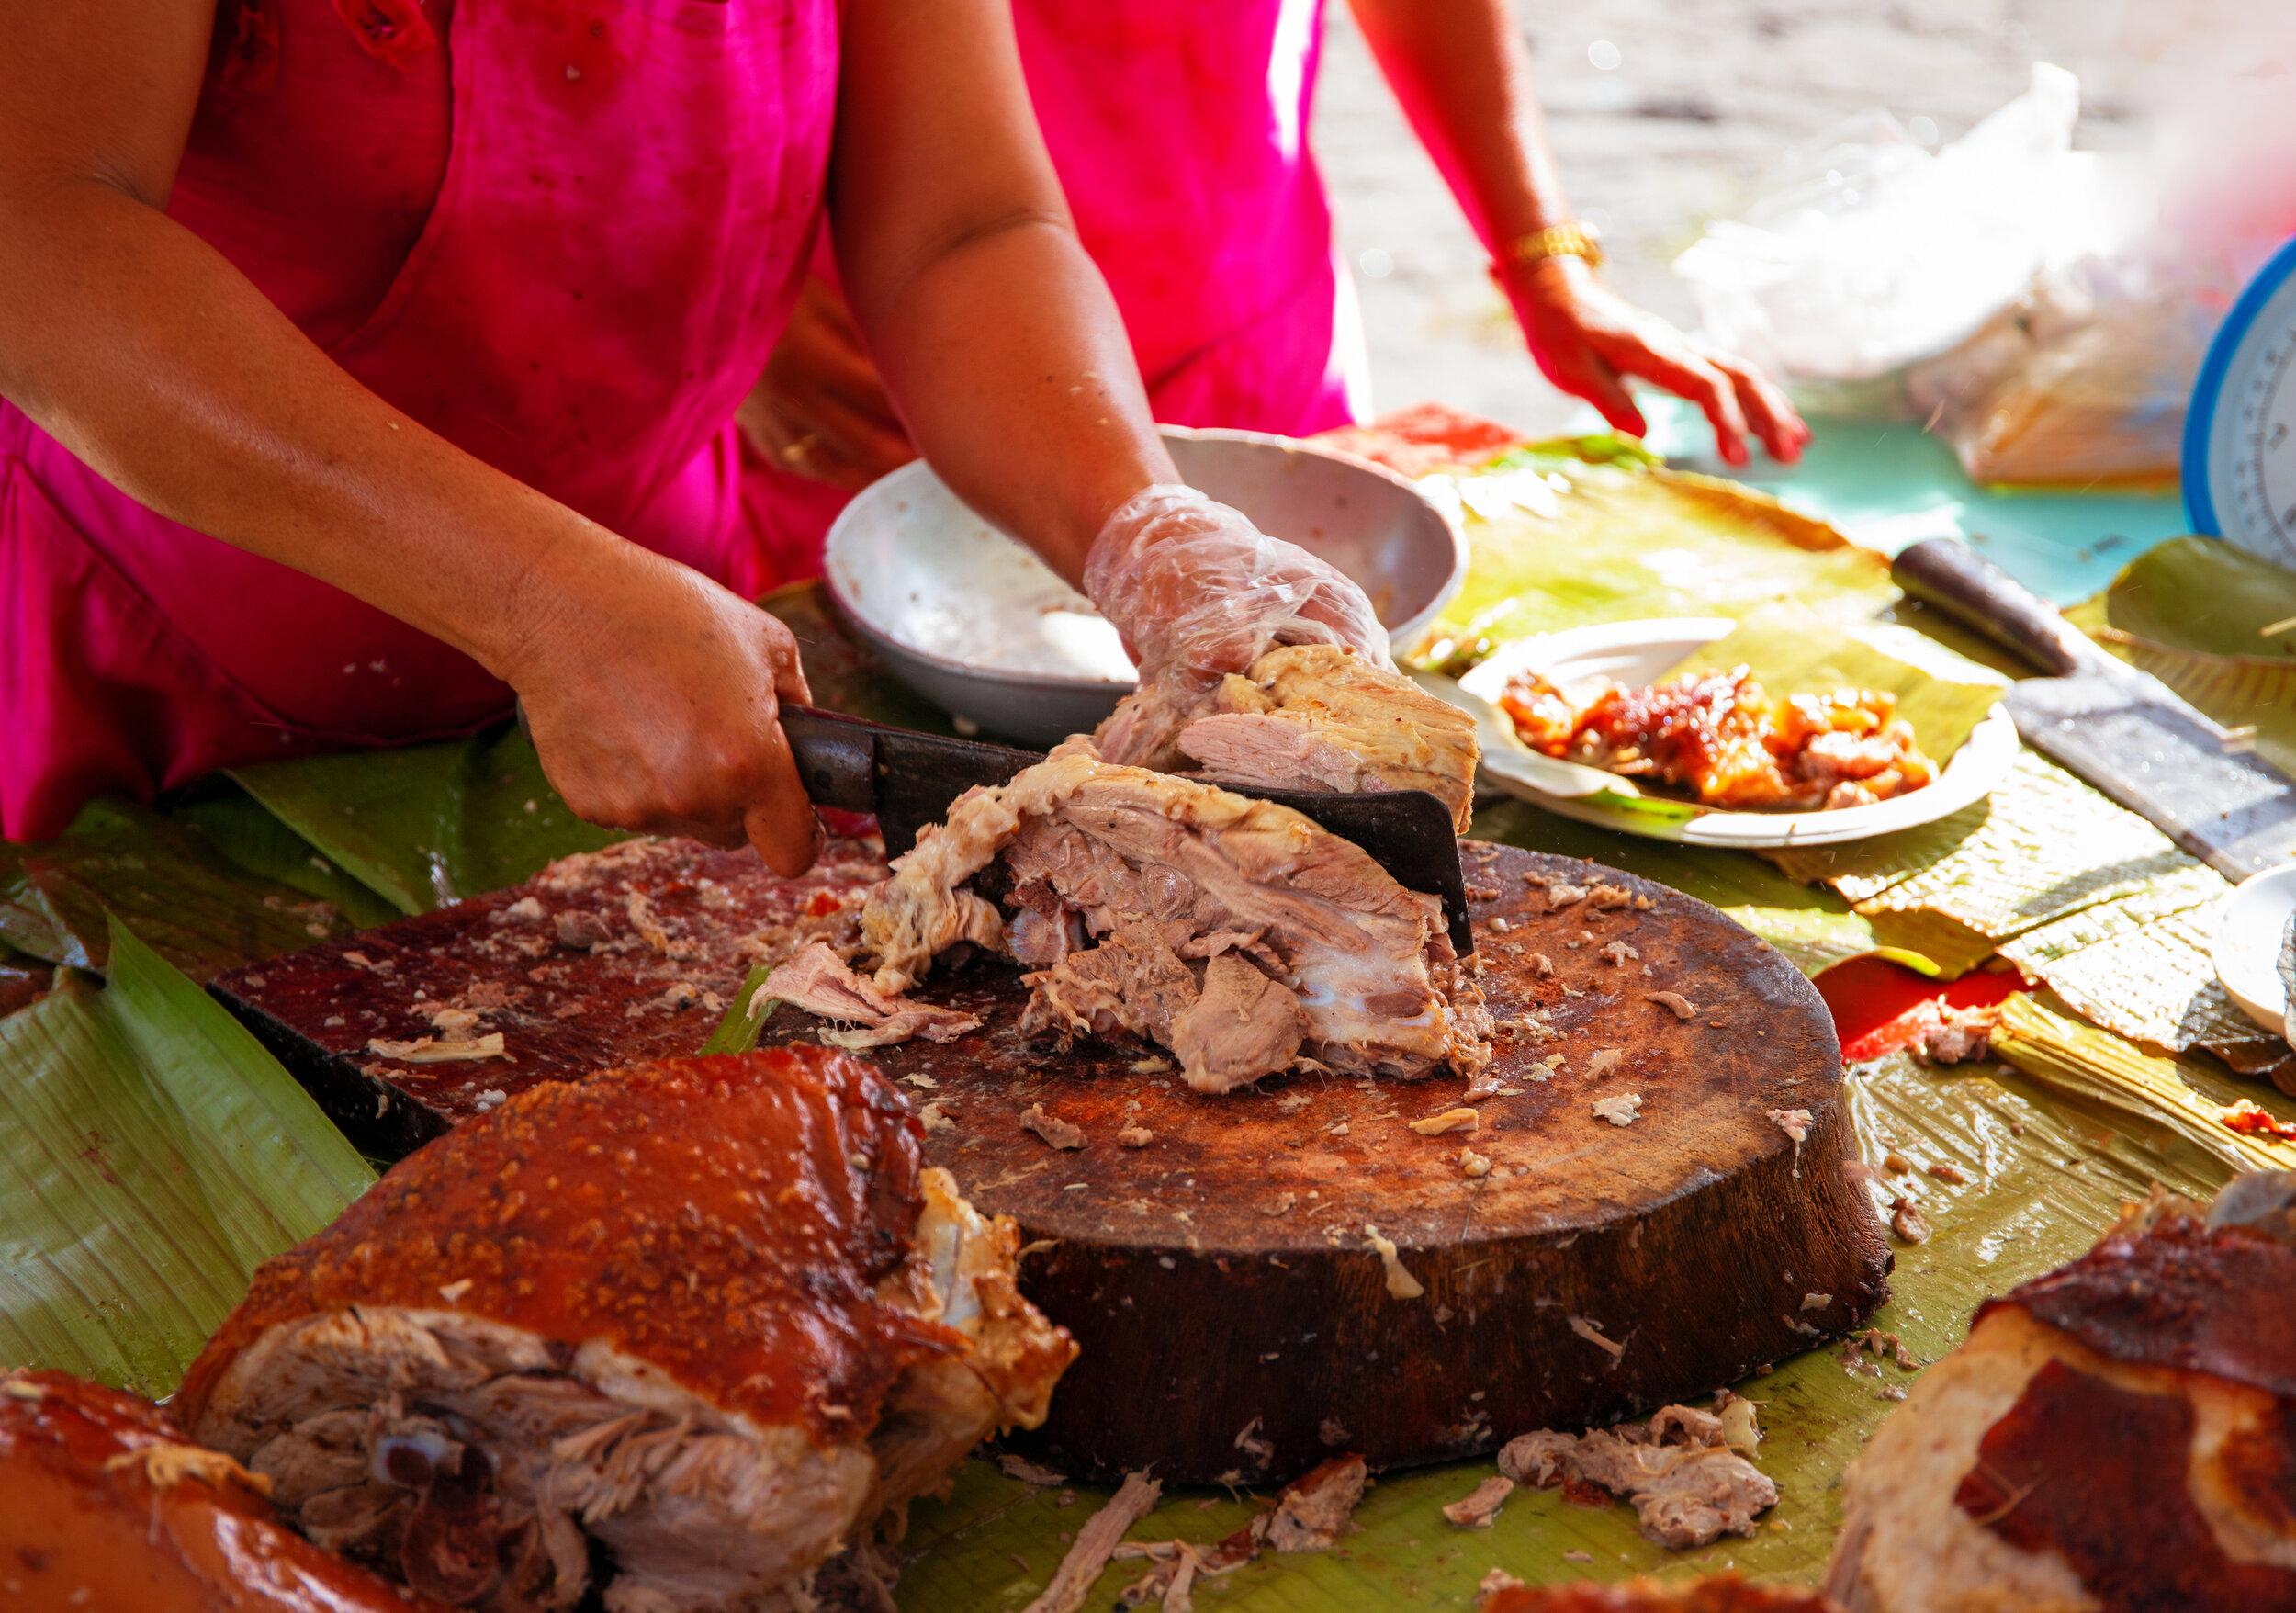 The filipino street food lechon, suckling pig.